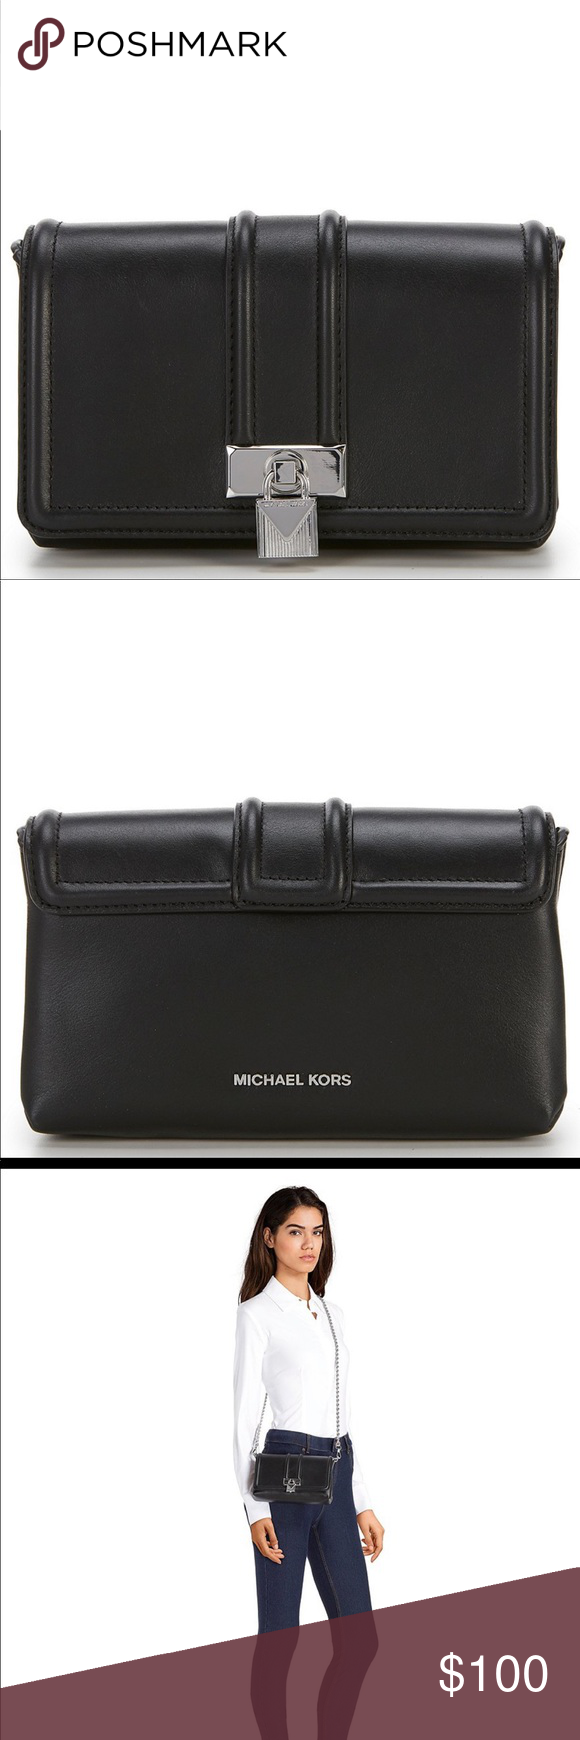 e41600fc4c93 Michael Kors Black Leather Padlock Chain Crossbody From MICHAEL Michael Kors